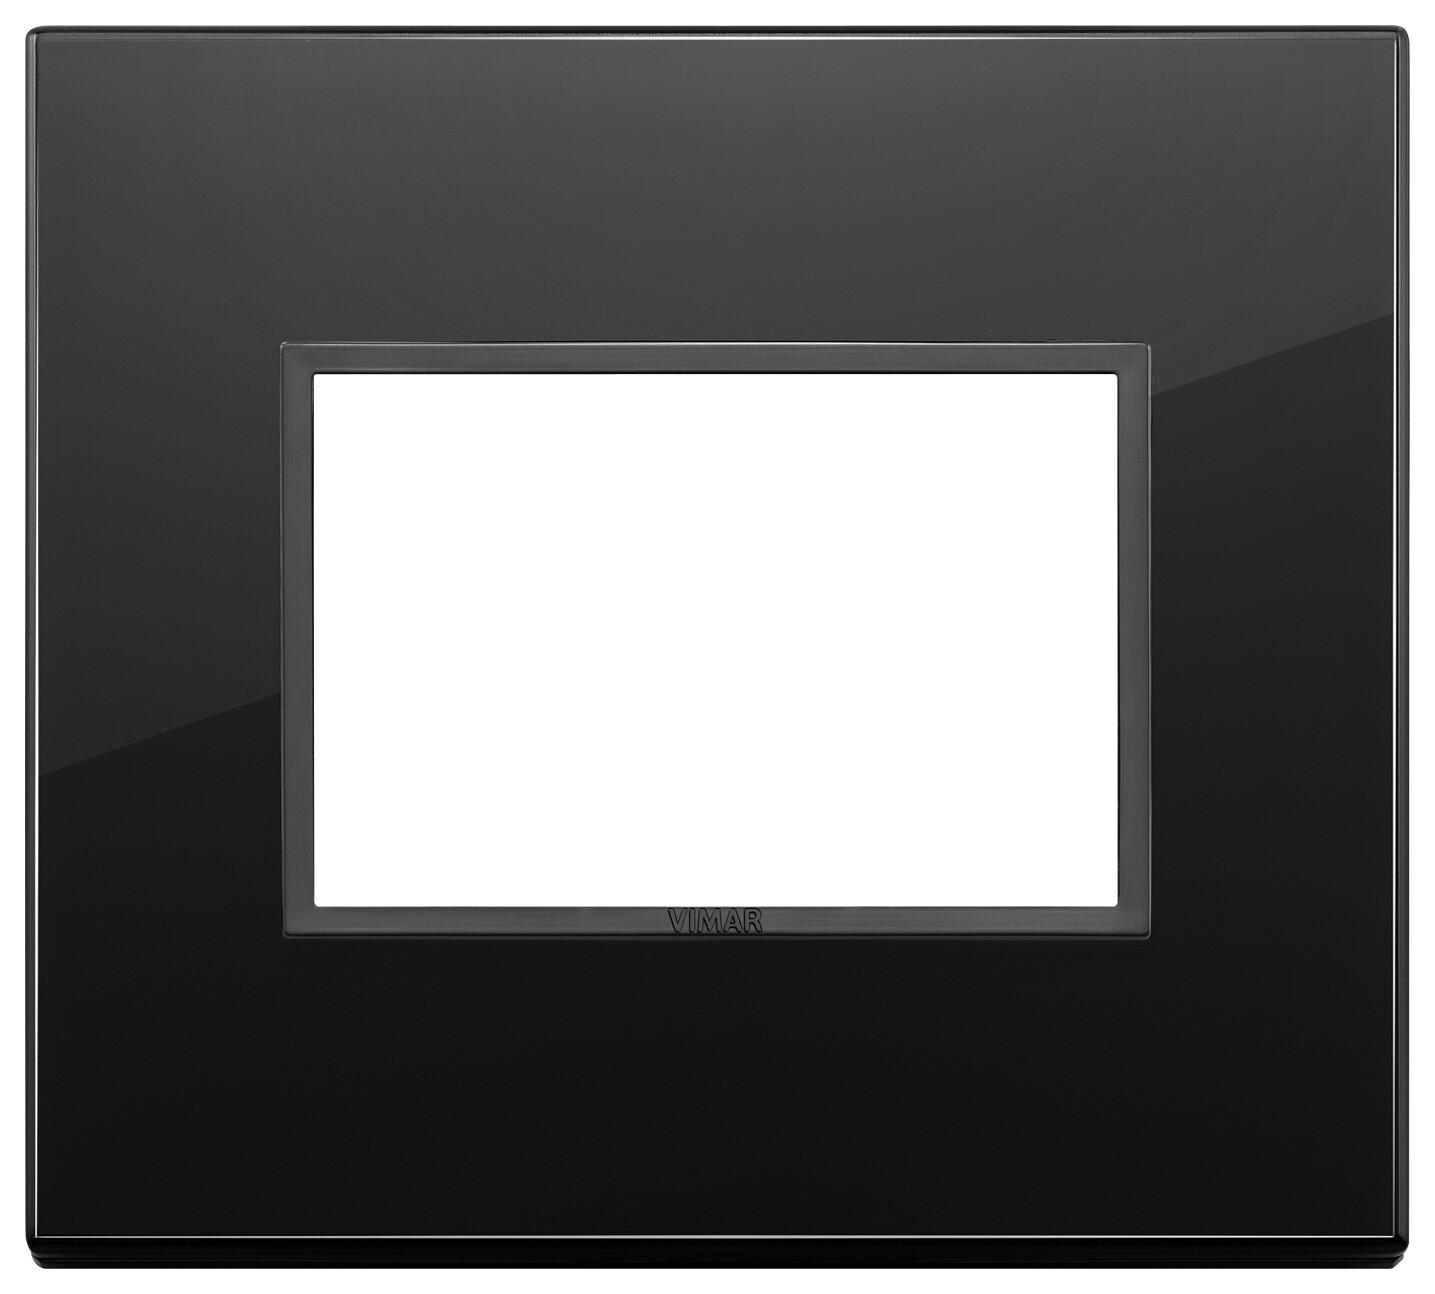 Накладка Evo на 3 модуля, полностью черный бриллиант